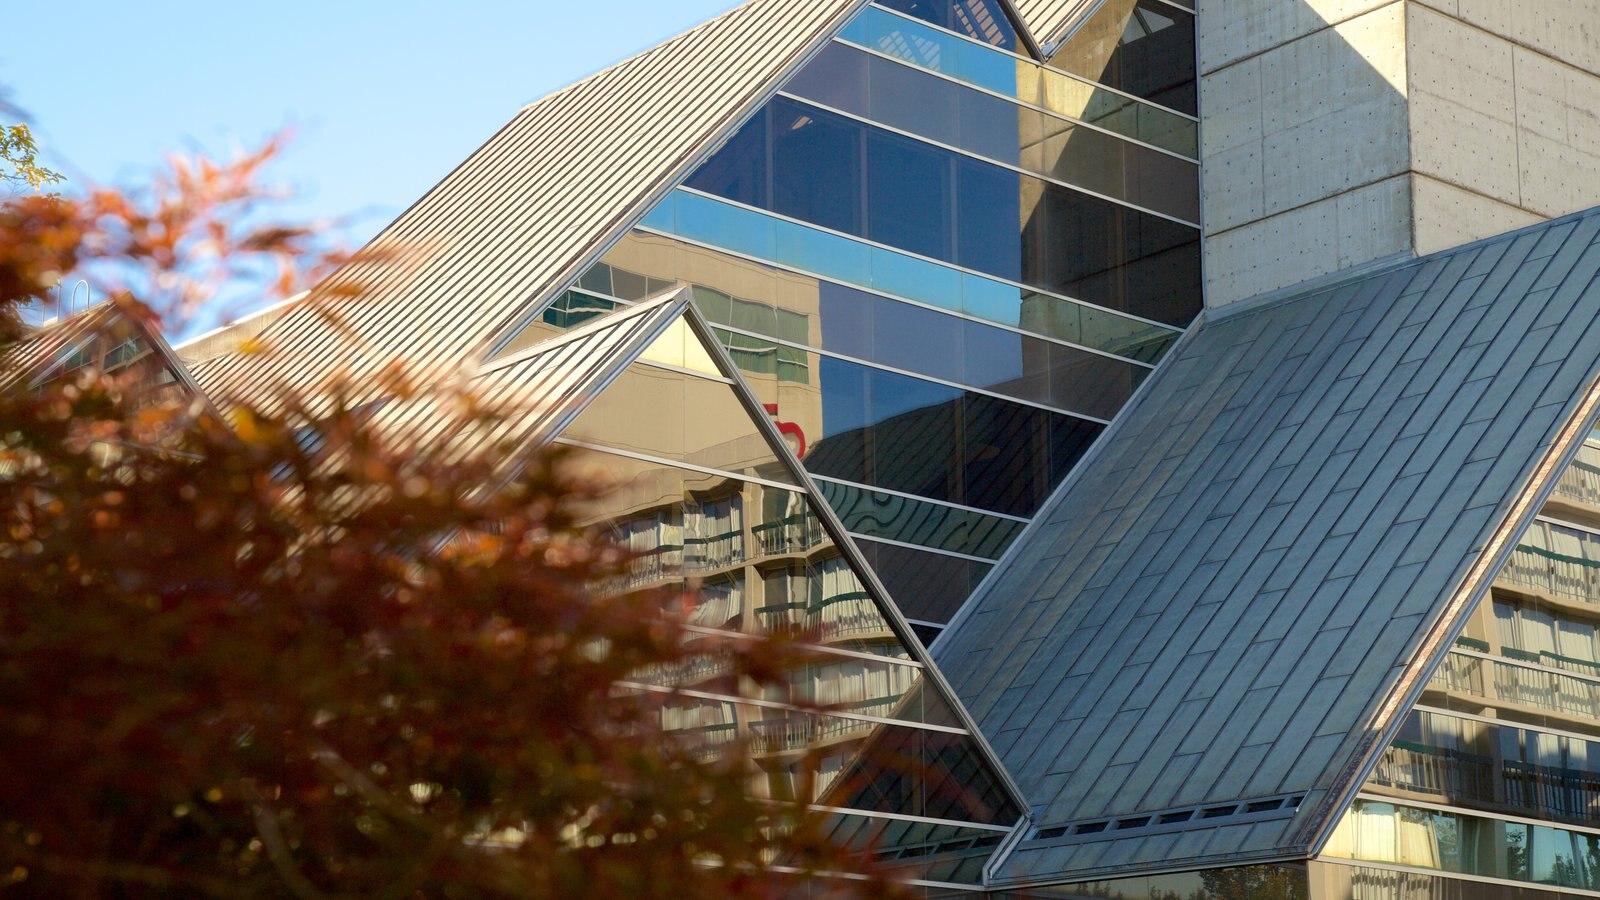 Hult Center for Performing Arts mostrando arquitectura moderna